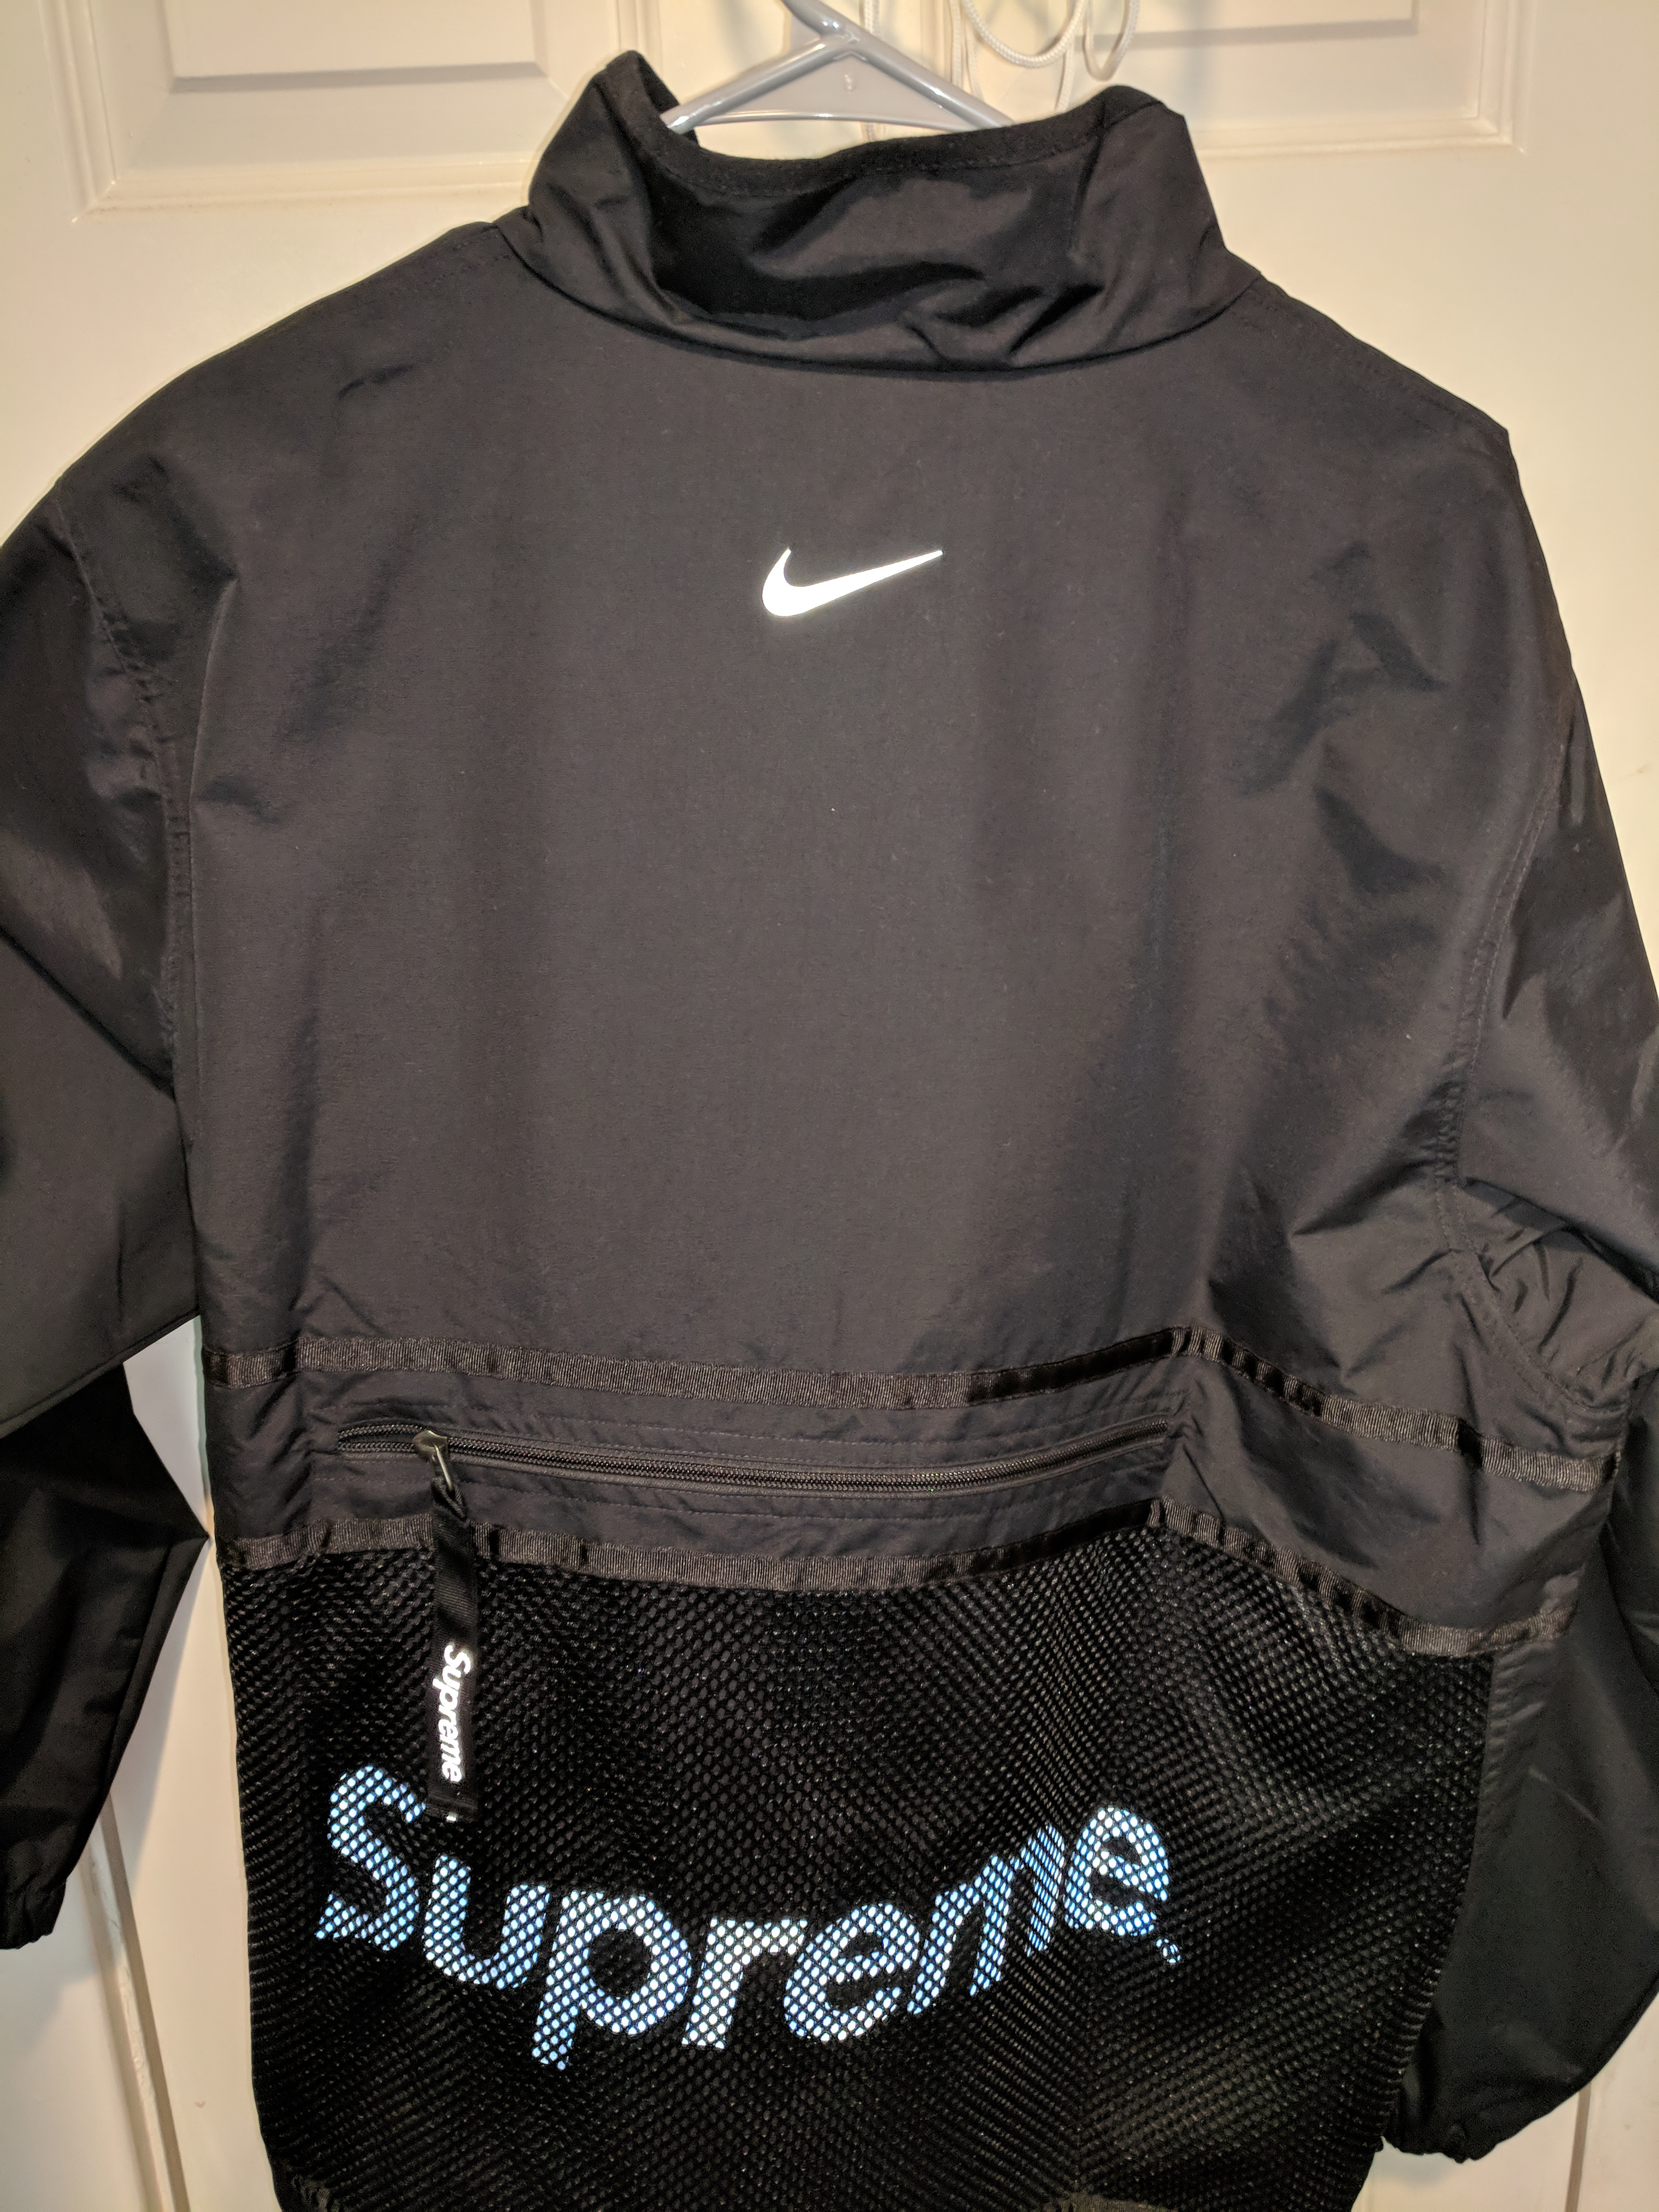 Supreme x Nike Trail Running Jacket Black